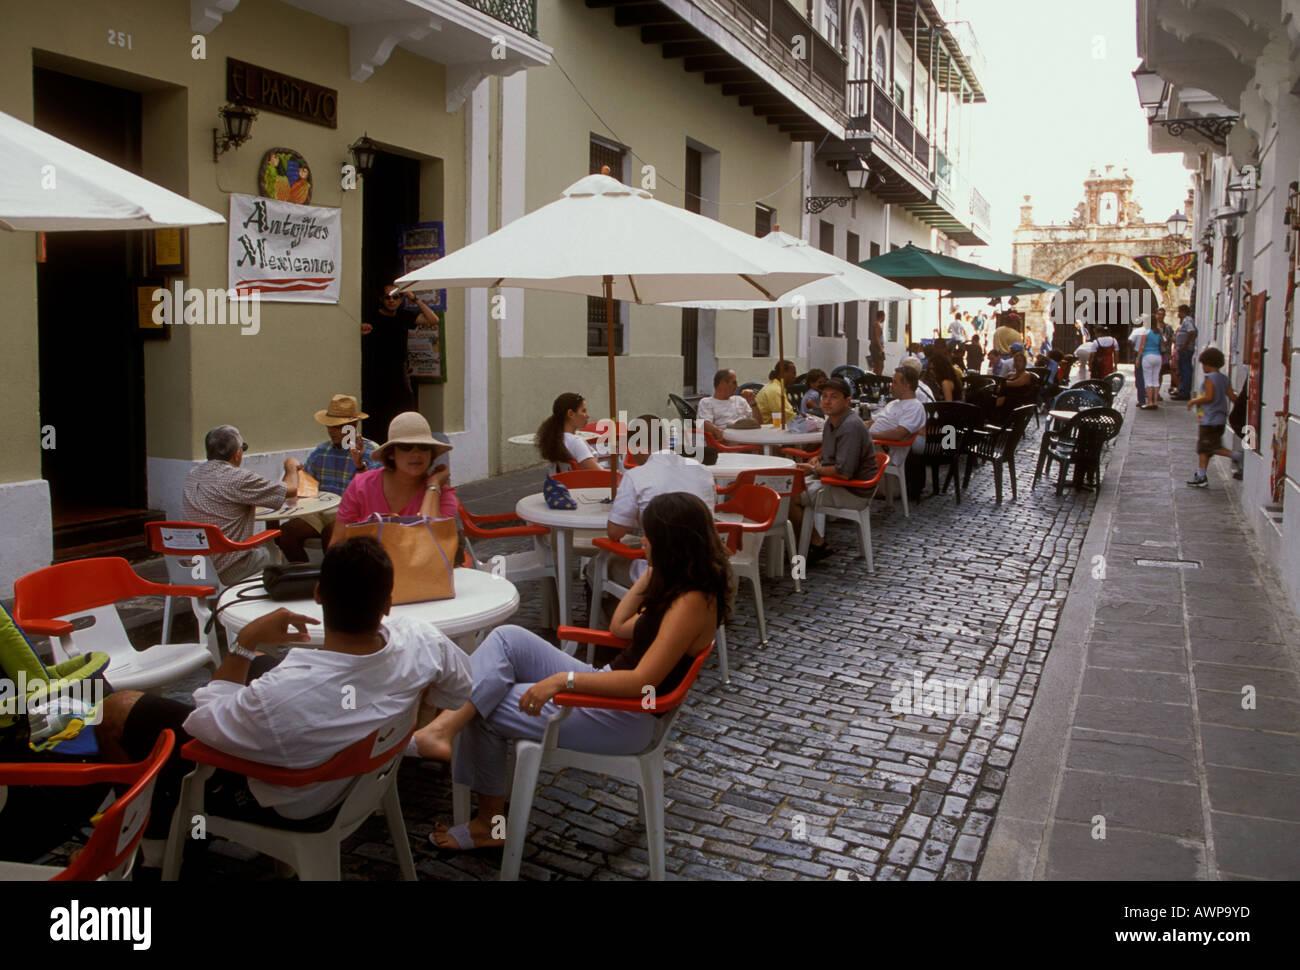 people, tourists, outdoor restaurant, outdoor cafe, puerto rican